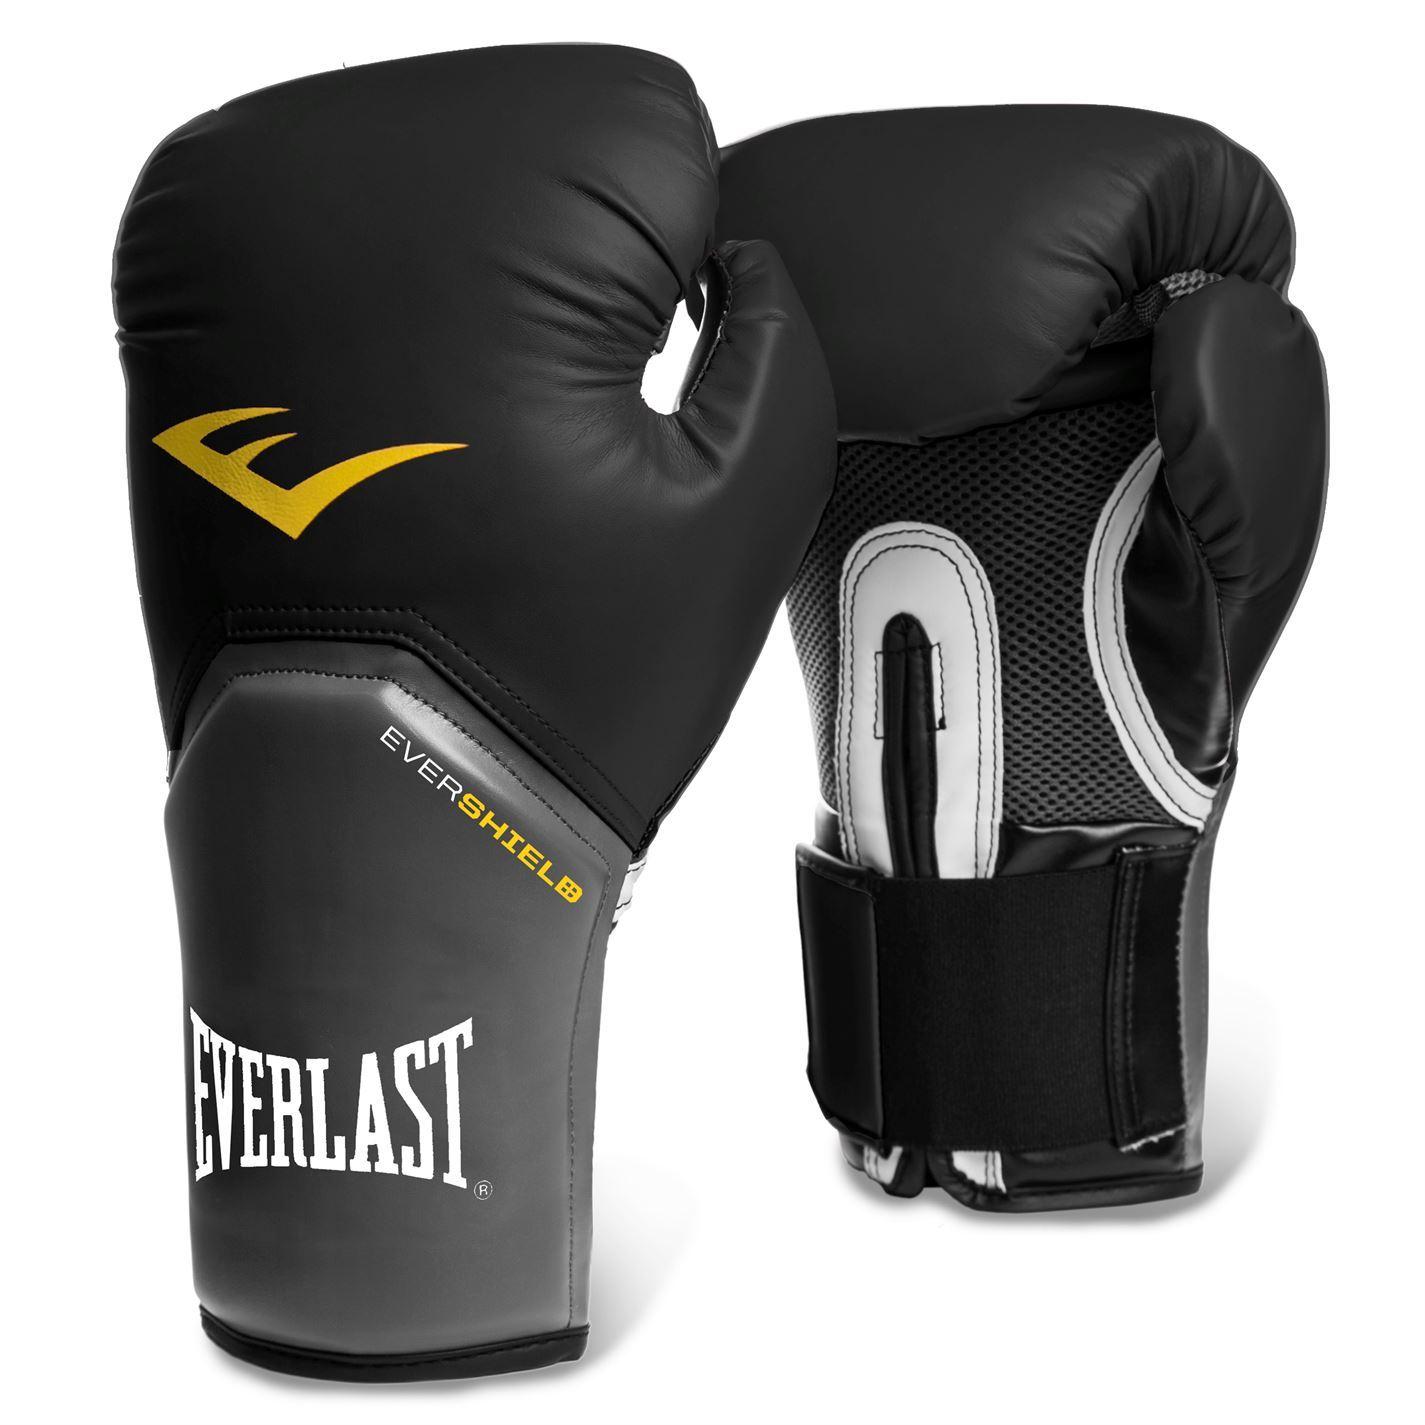 Everlast Gloves Elite Training Evershield Boxing Gloves Everlast Gym Fitness Bag Sparring Gloves 4ffbd7